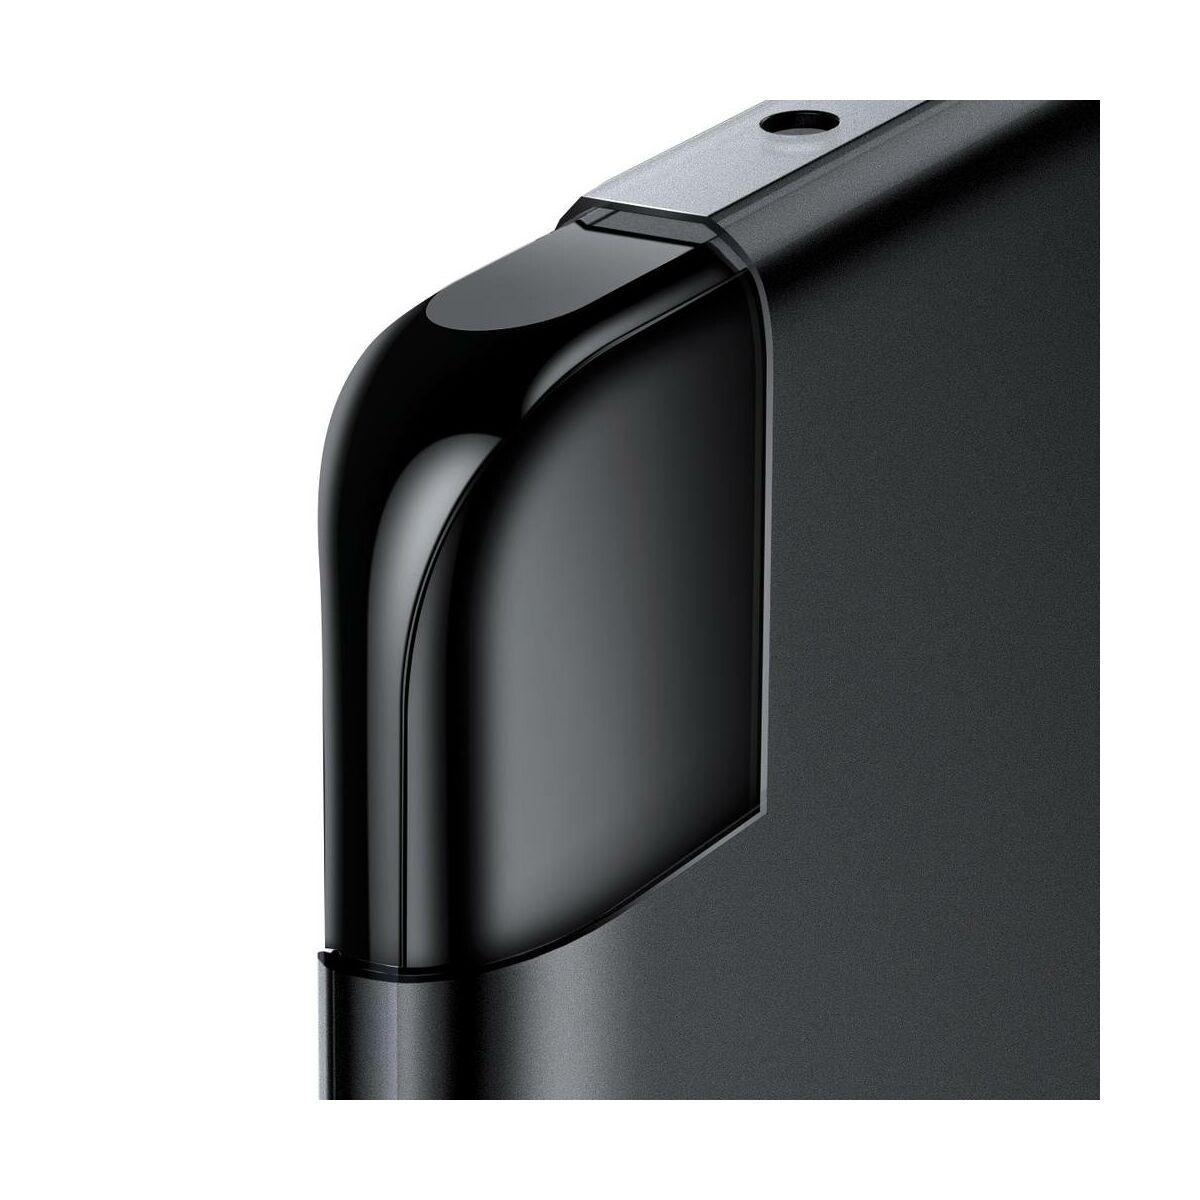 Baseus Huawei P30 Pro tok, Wing, átlátszó fekete (WIHWP30P-01)